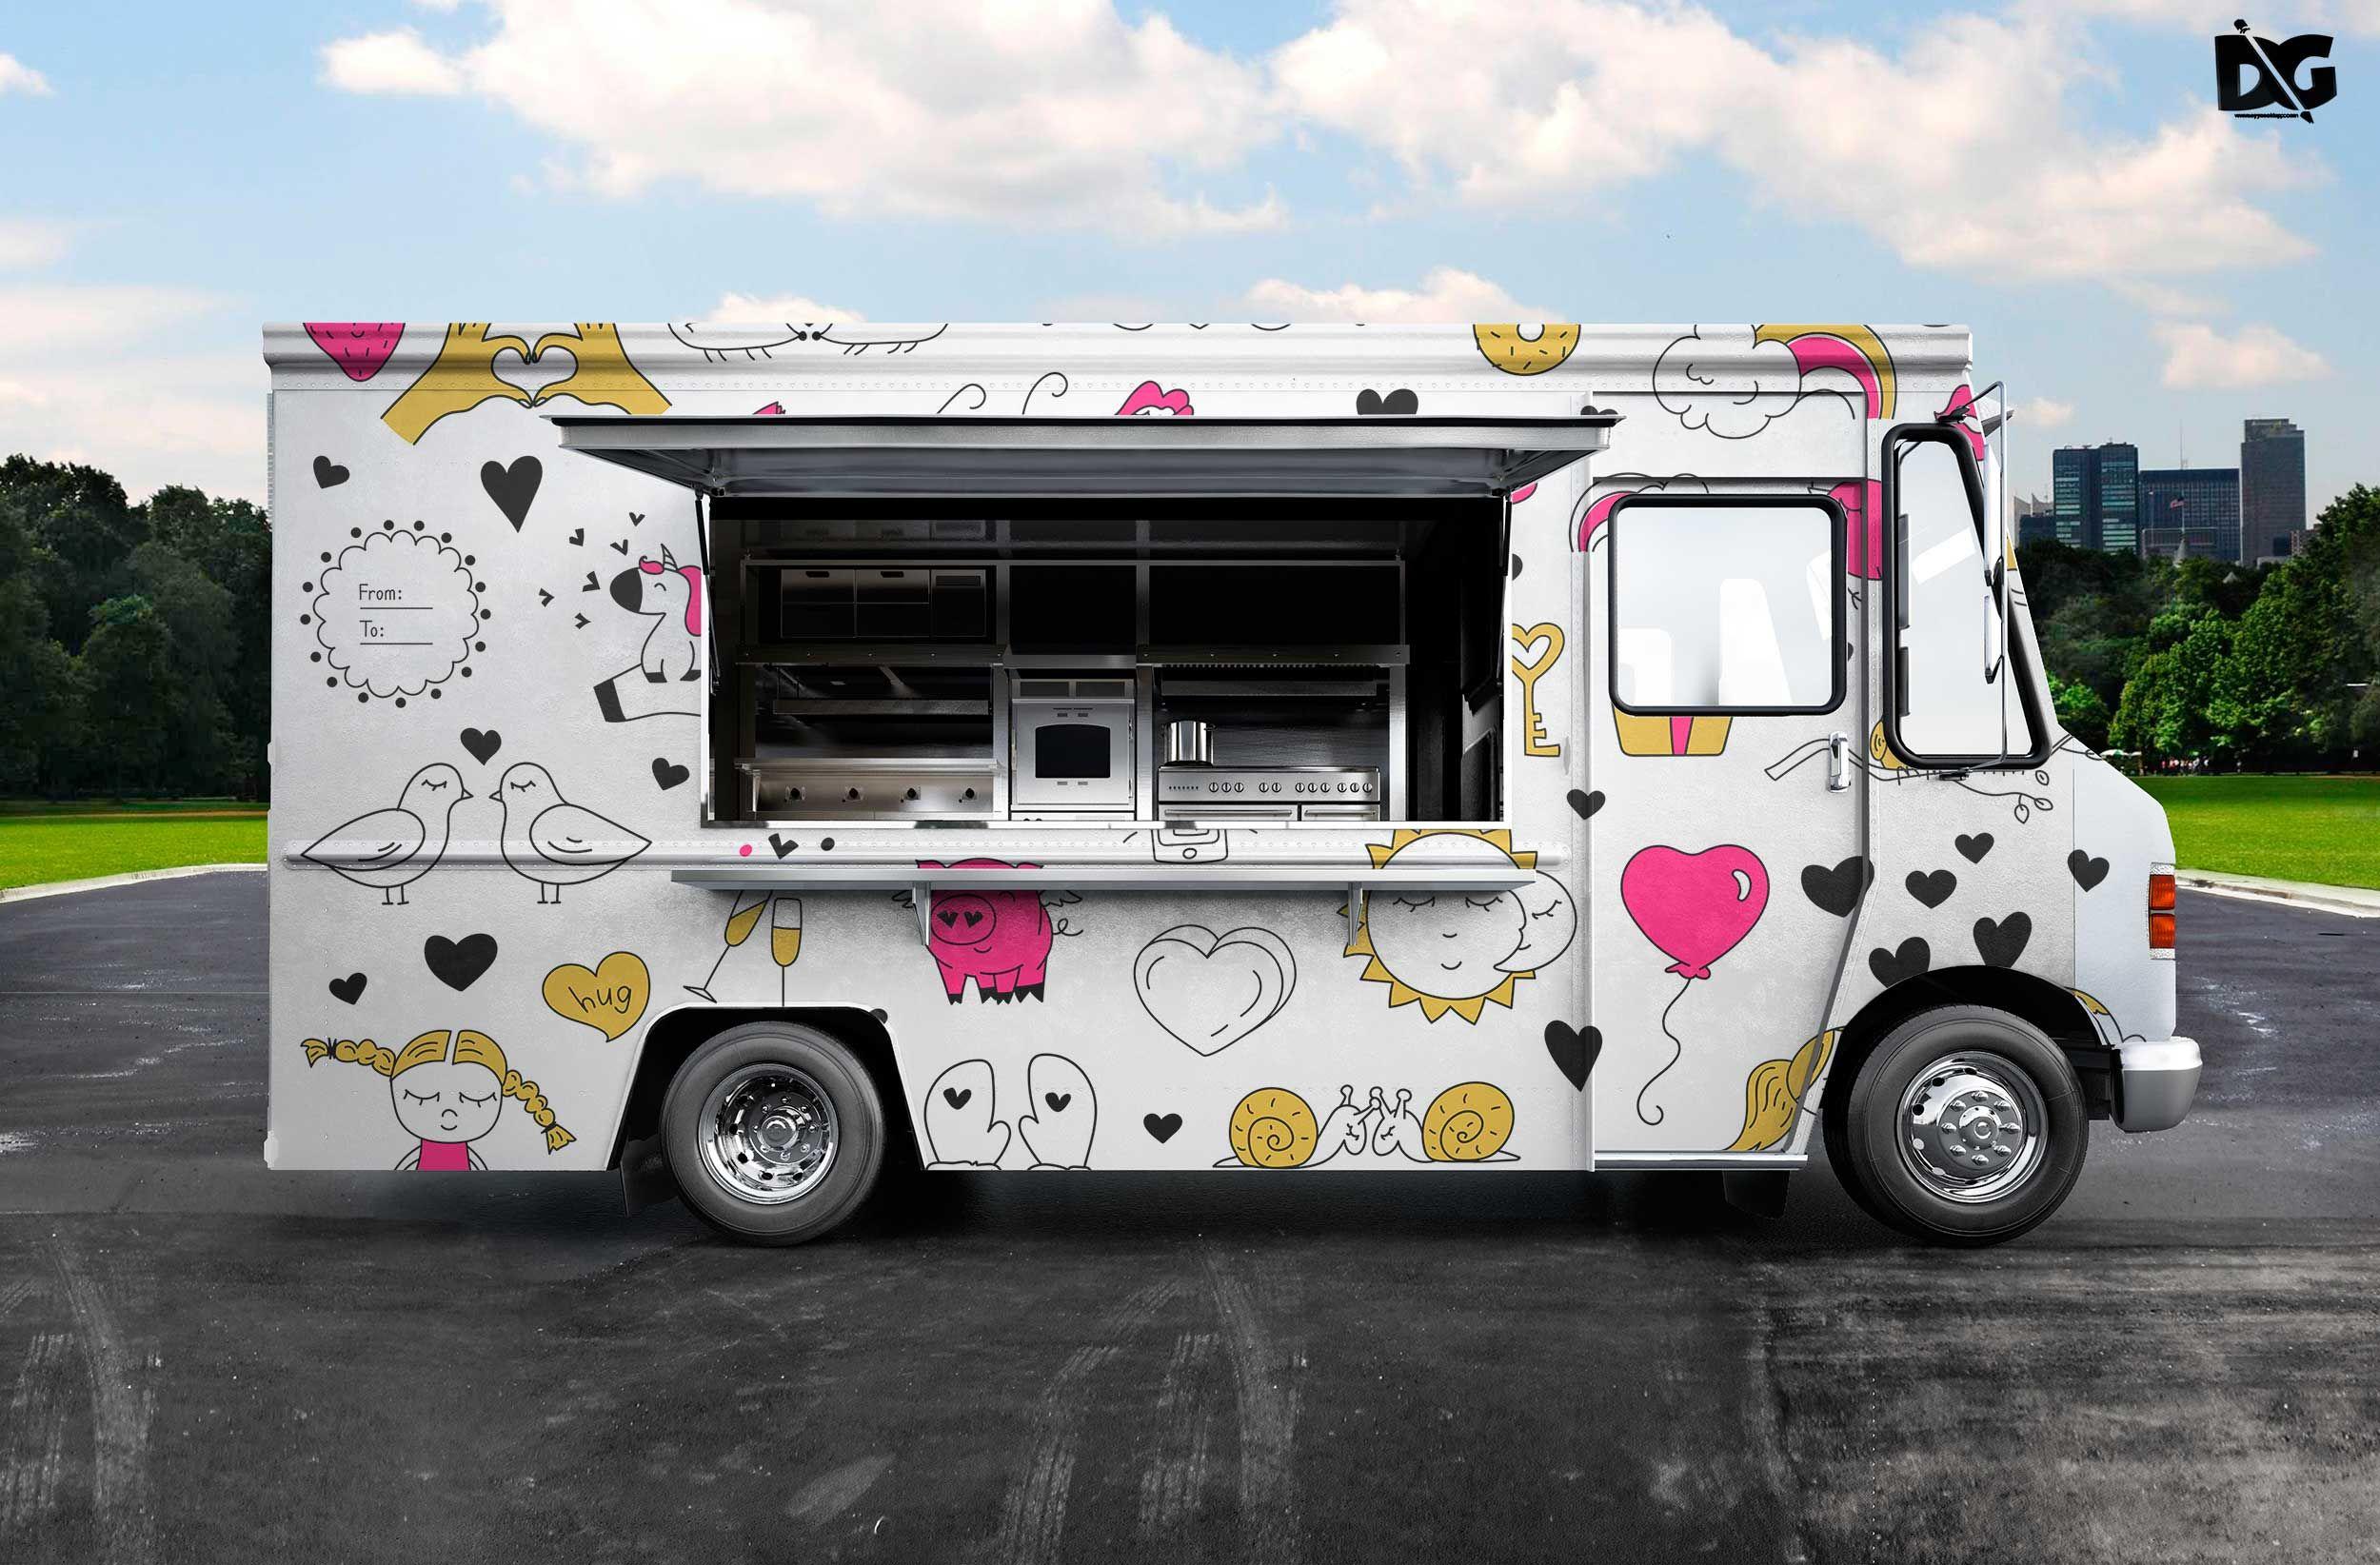 PSD Burger Food Truck Design Mockup (With images) Food